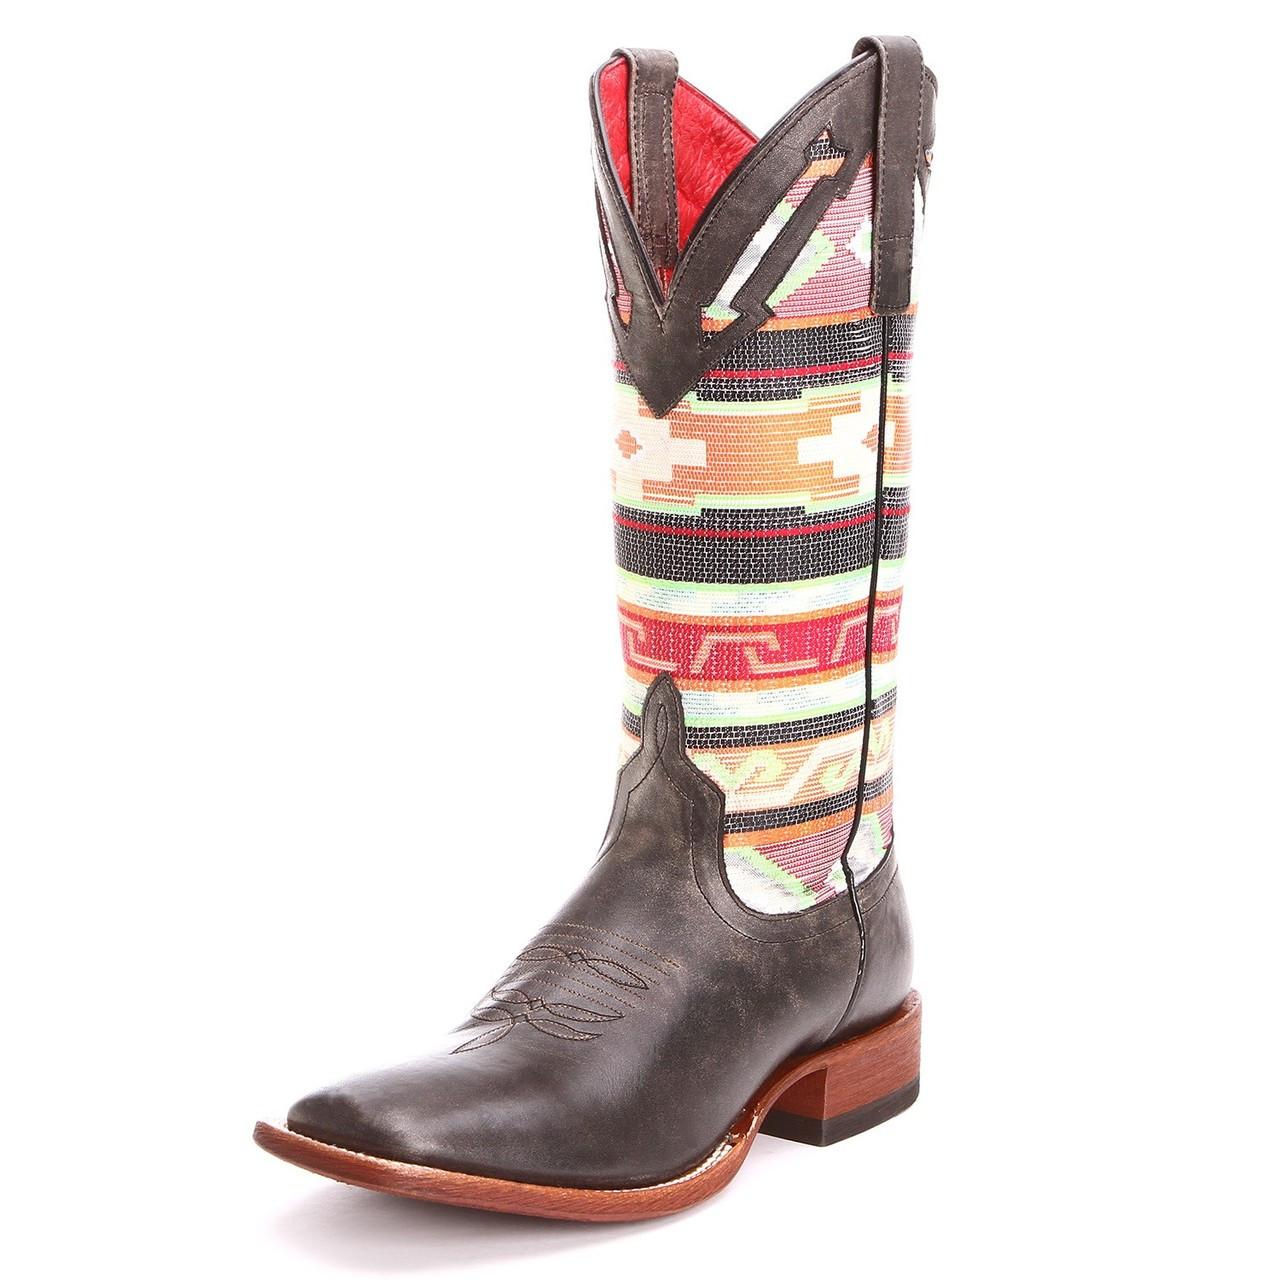 86194f83cd3 Macie Bean Womens Cracktacular Serape Square Toe Cowboy Boots Black - M-9081